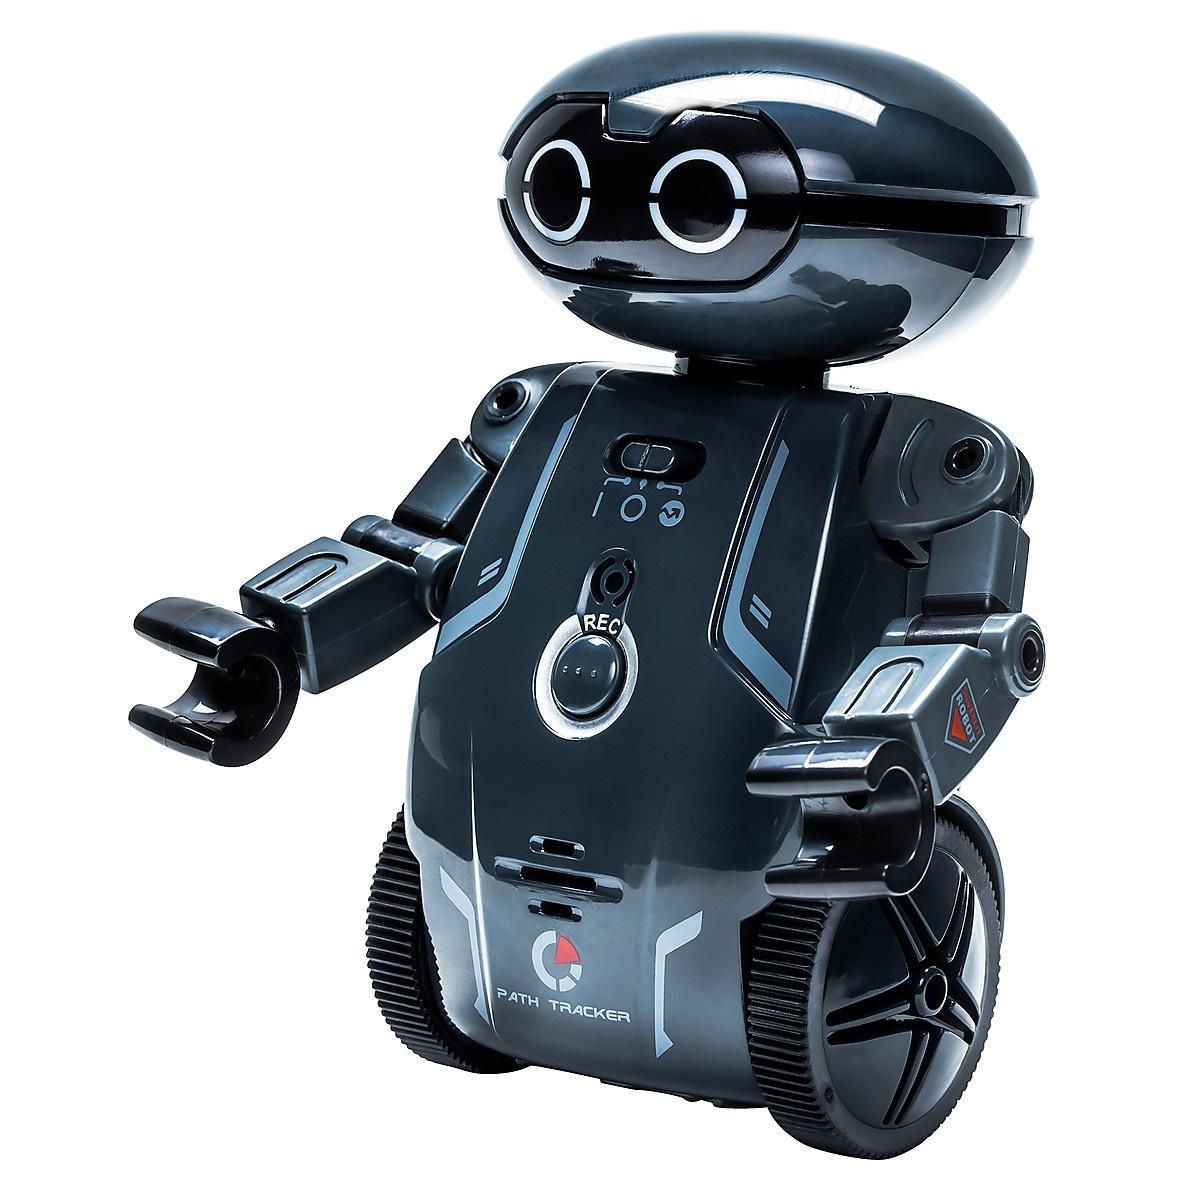 Silverlit Mazebreaker robot